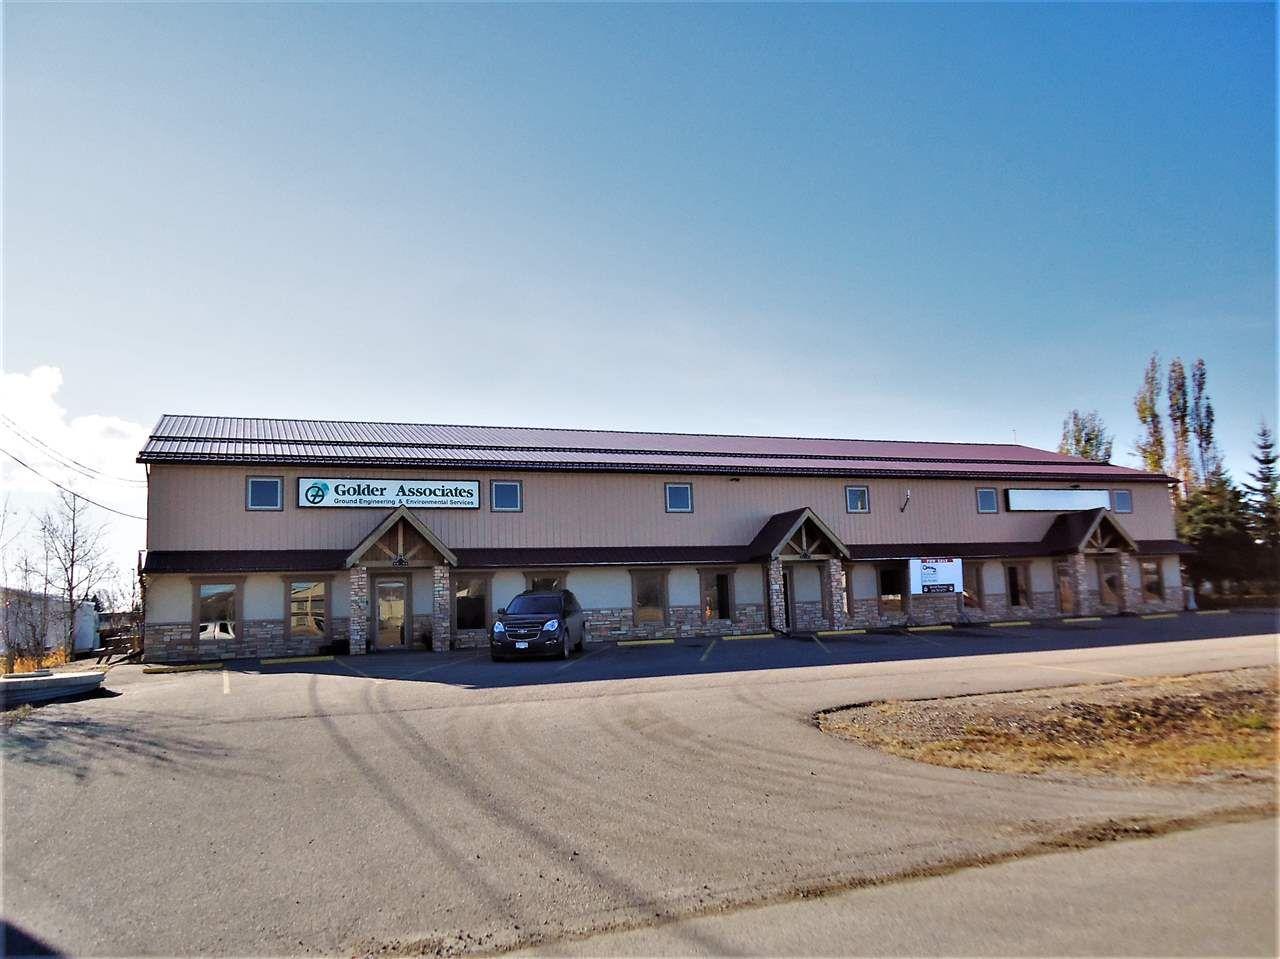 Main Photo: 10628 PECK LANE: Commercial for sale : MLS®# C8014855